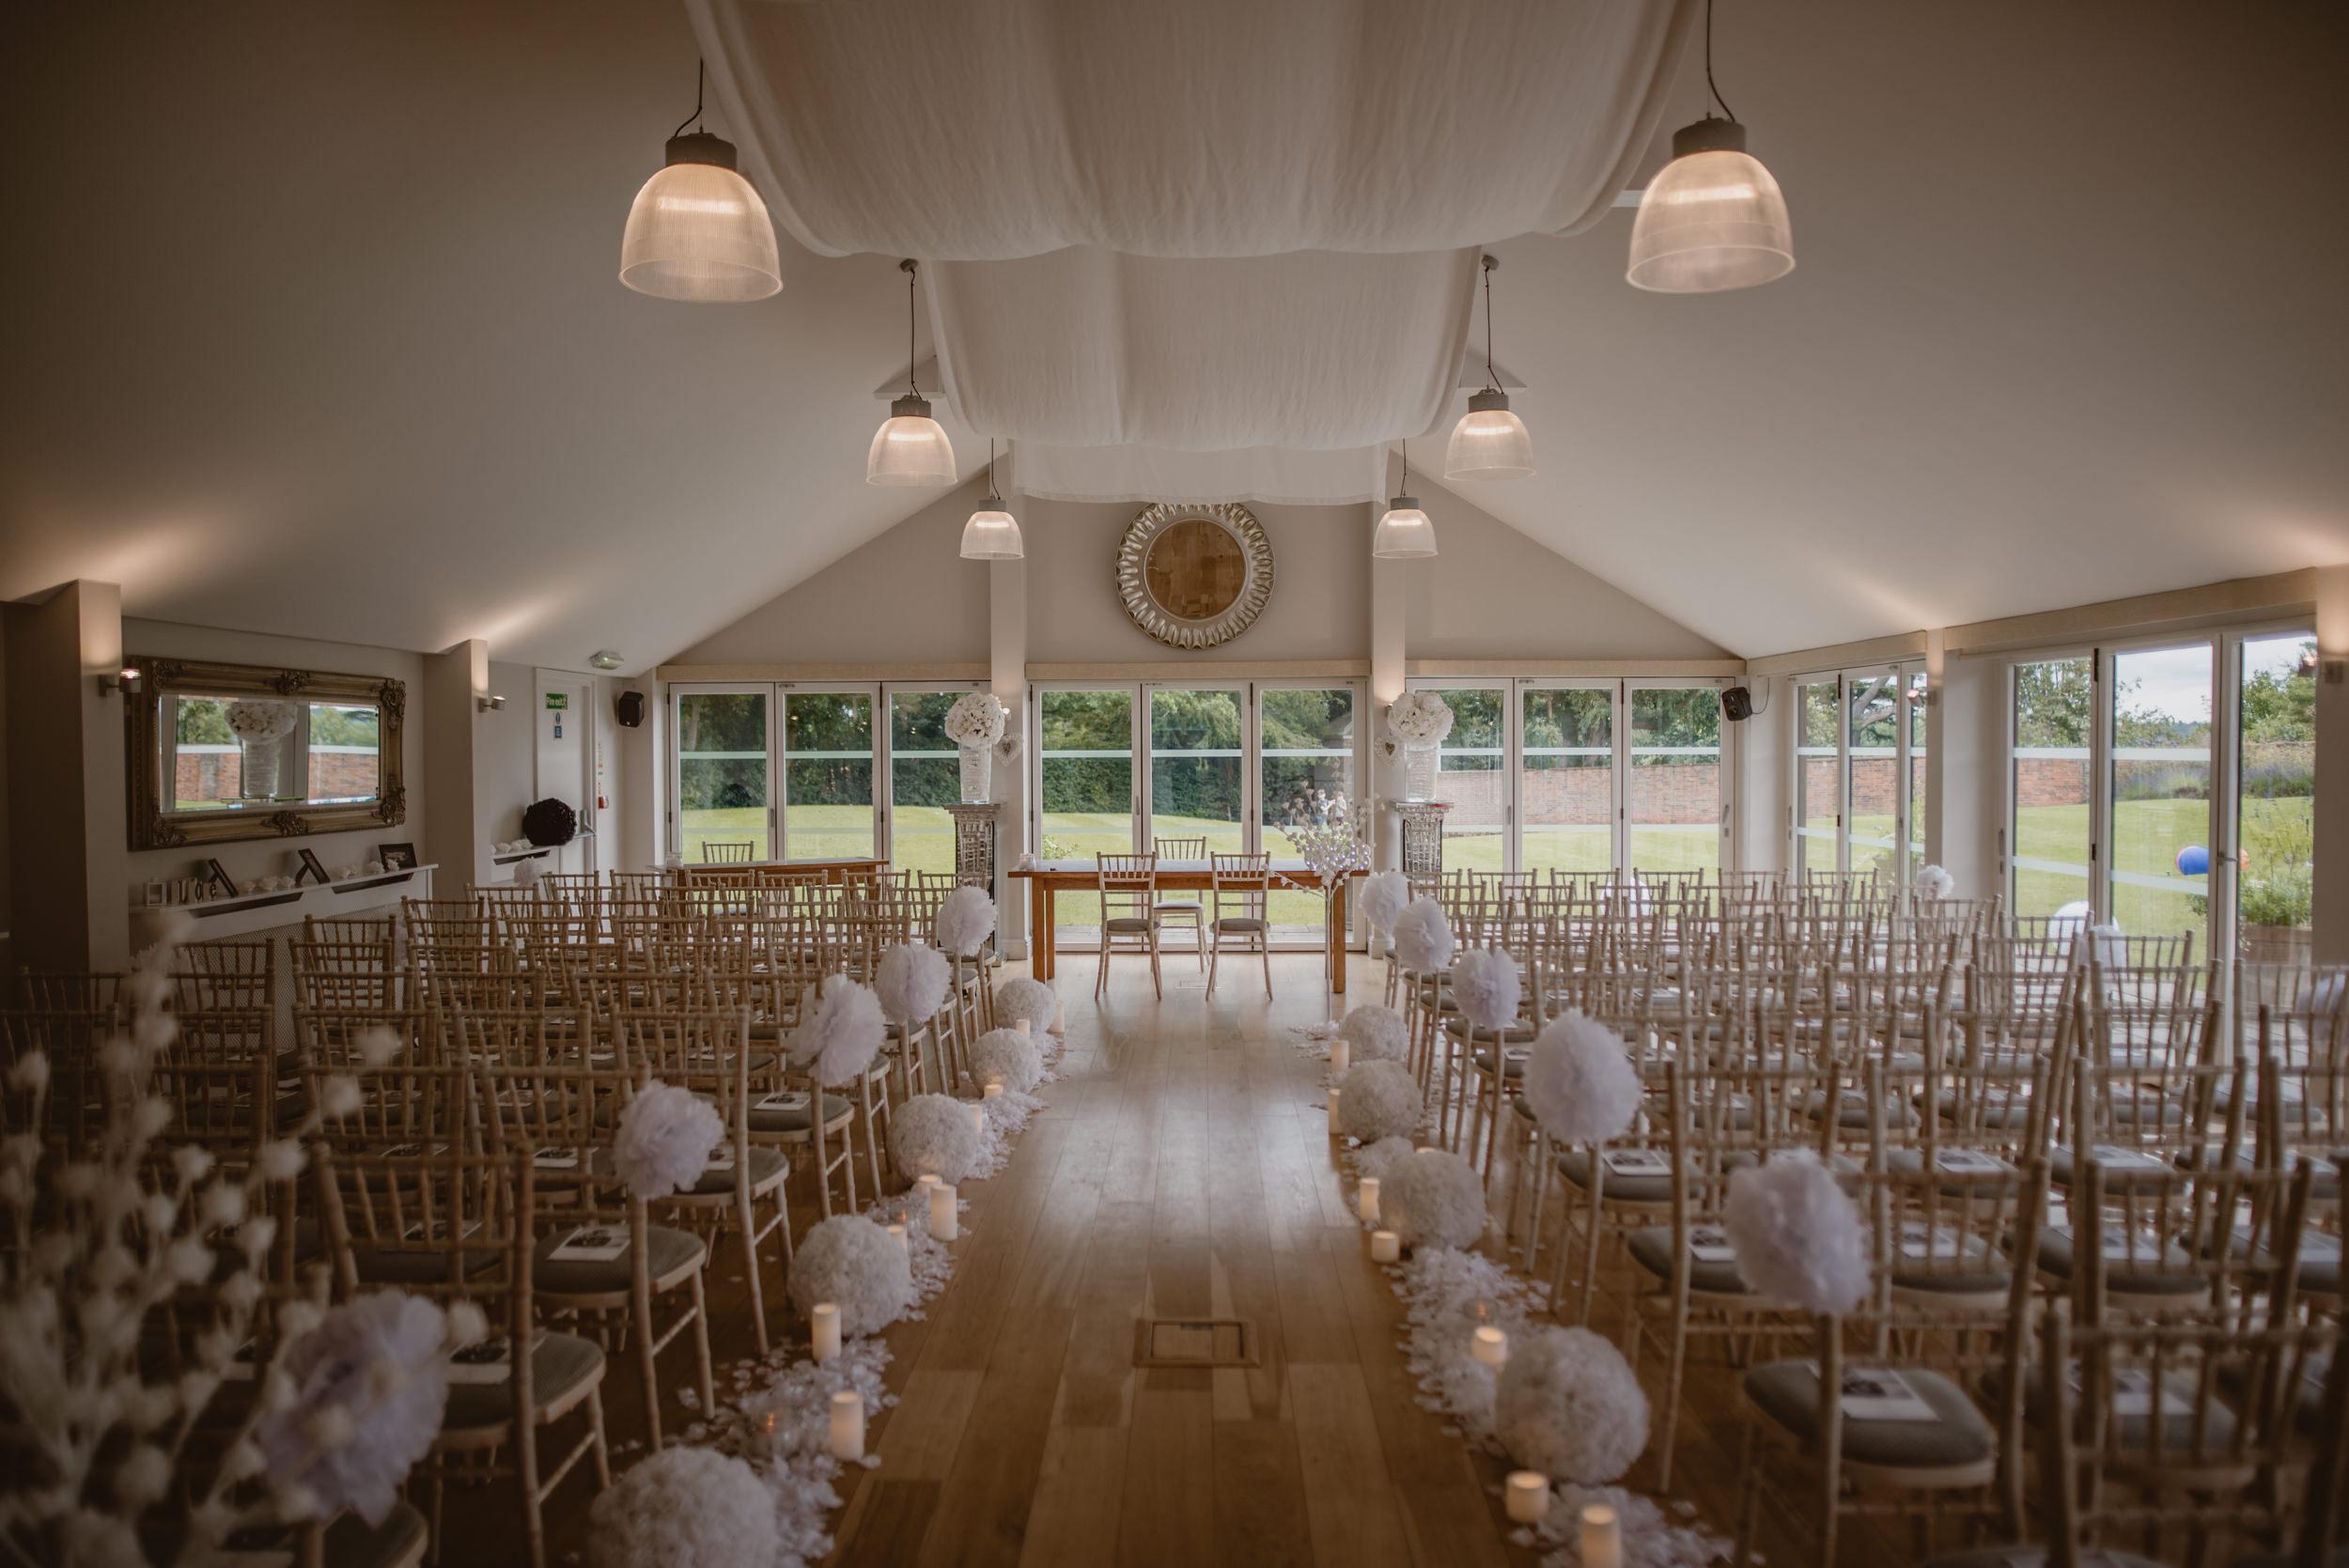 Barry-and-Chaz-wedding-Wasing-Park-Berkshire-Manu-Mendoza-Wedding-Photography-008.jpg